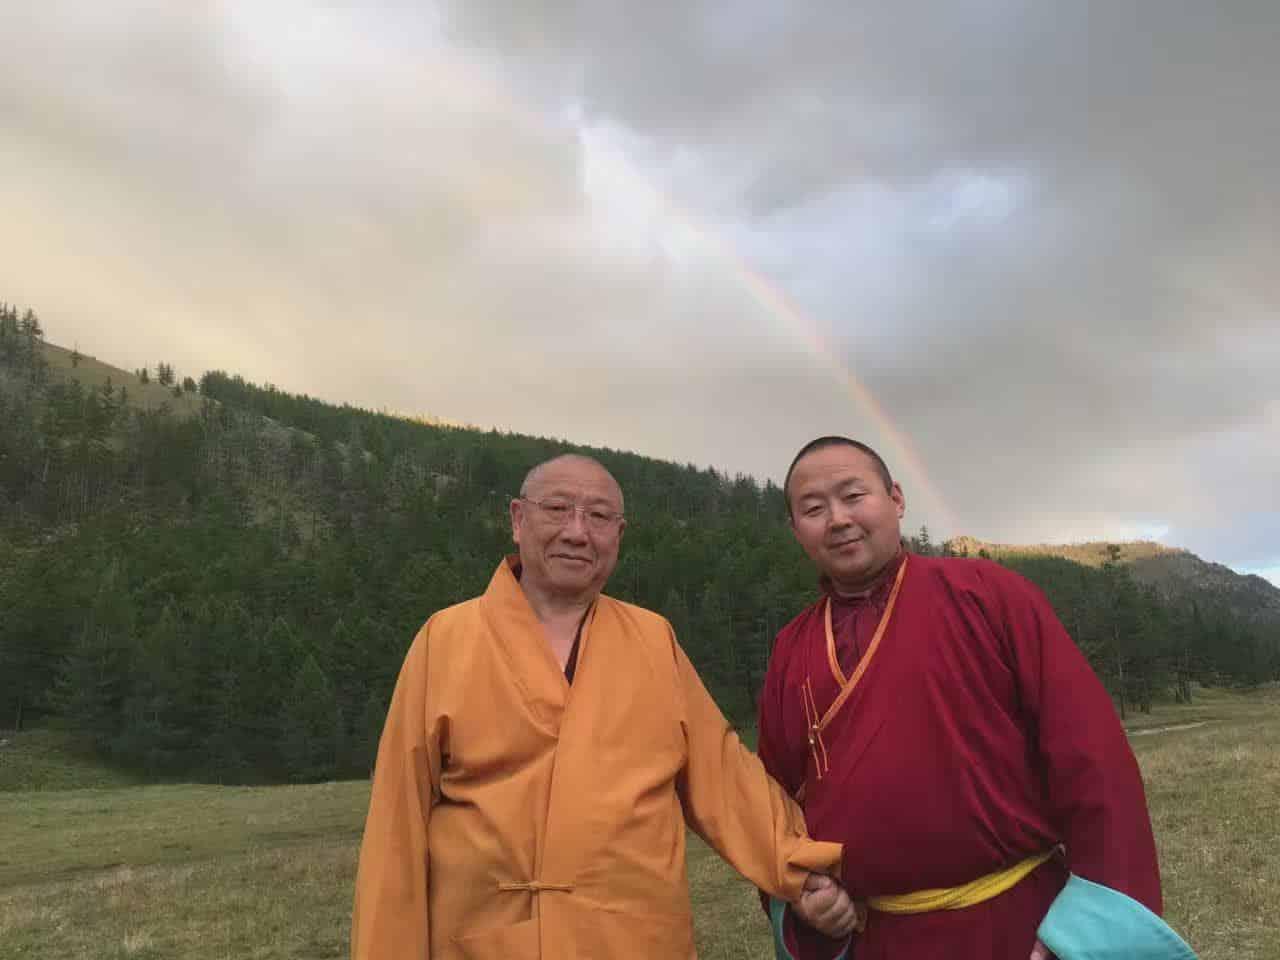 gosok-rinpoche-mongolia-2016-1c48e87e4084b77a3b0de872576738d